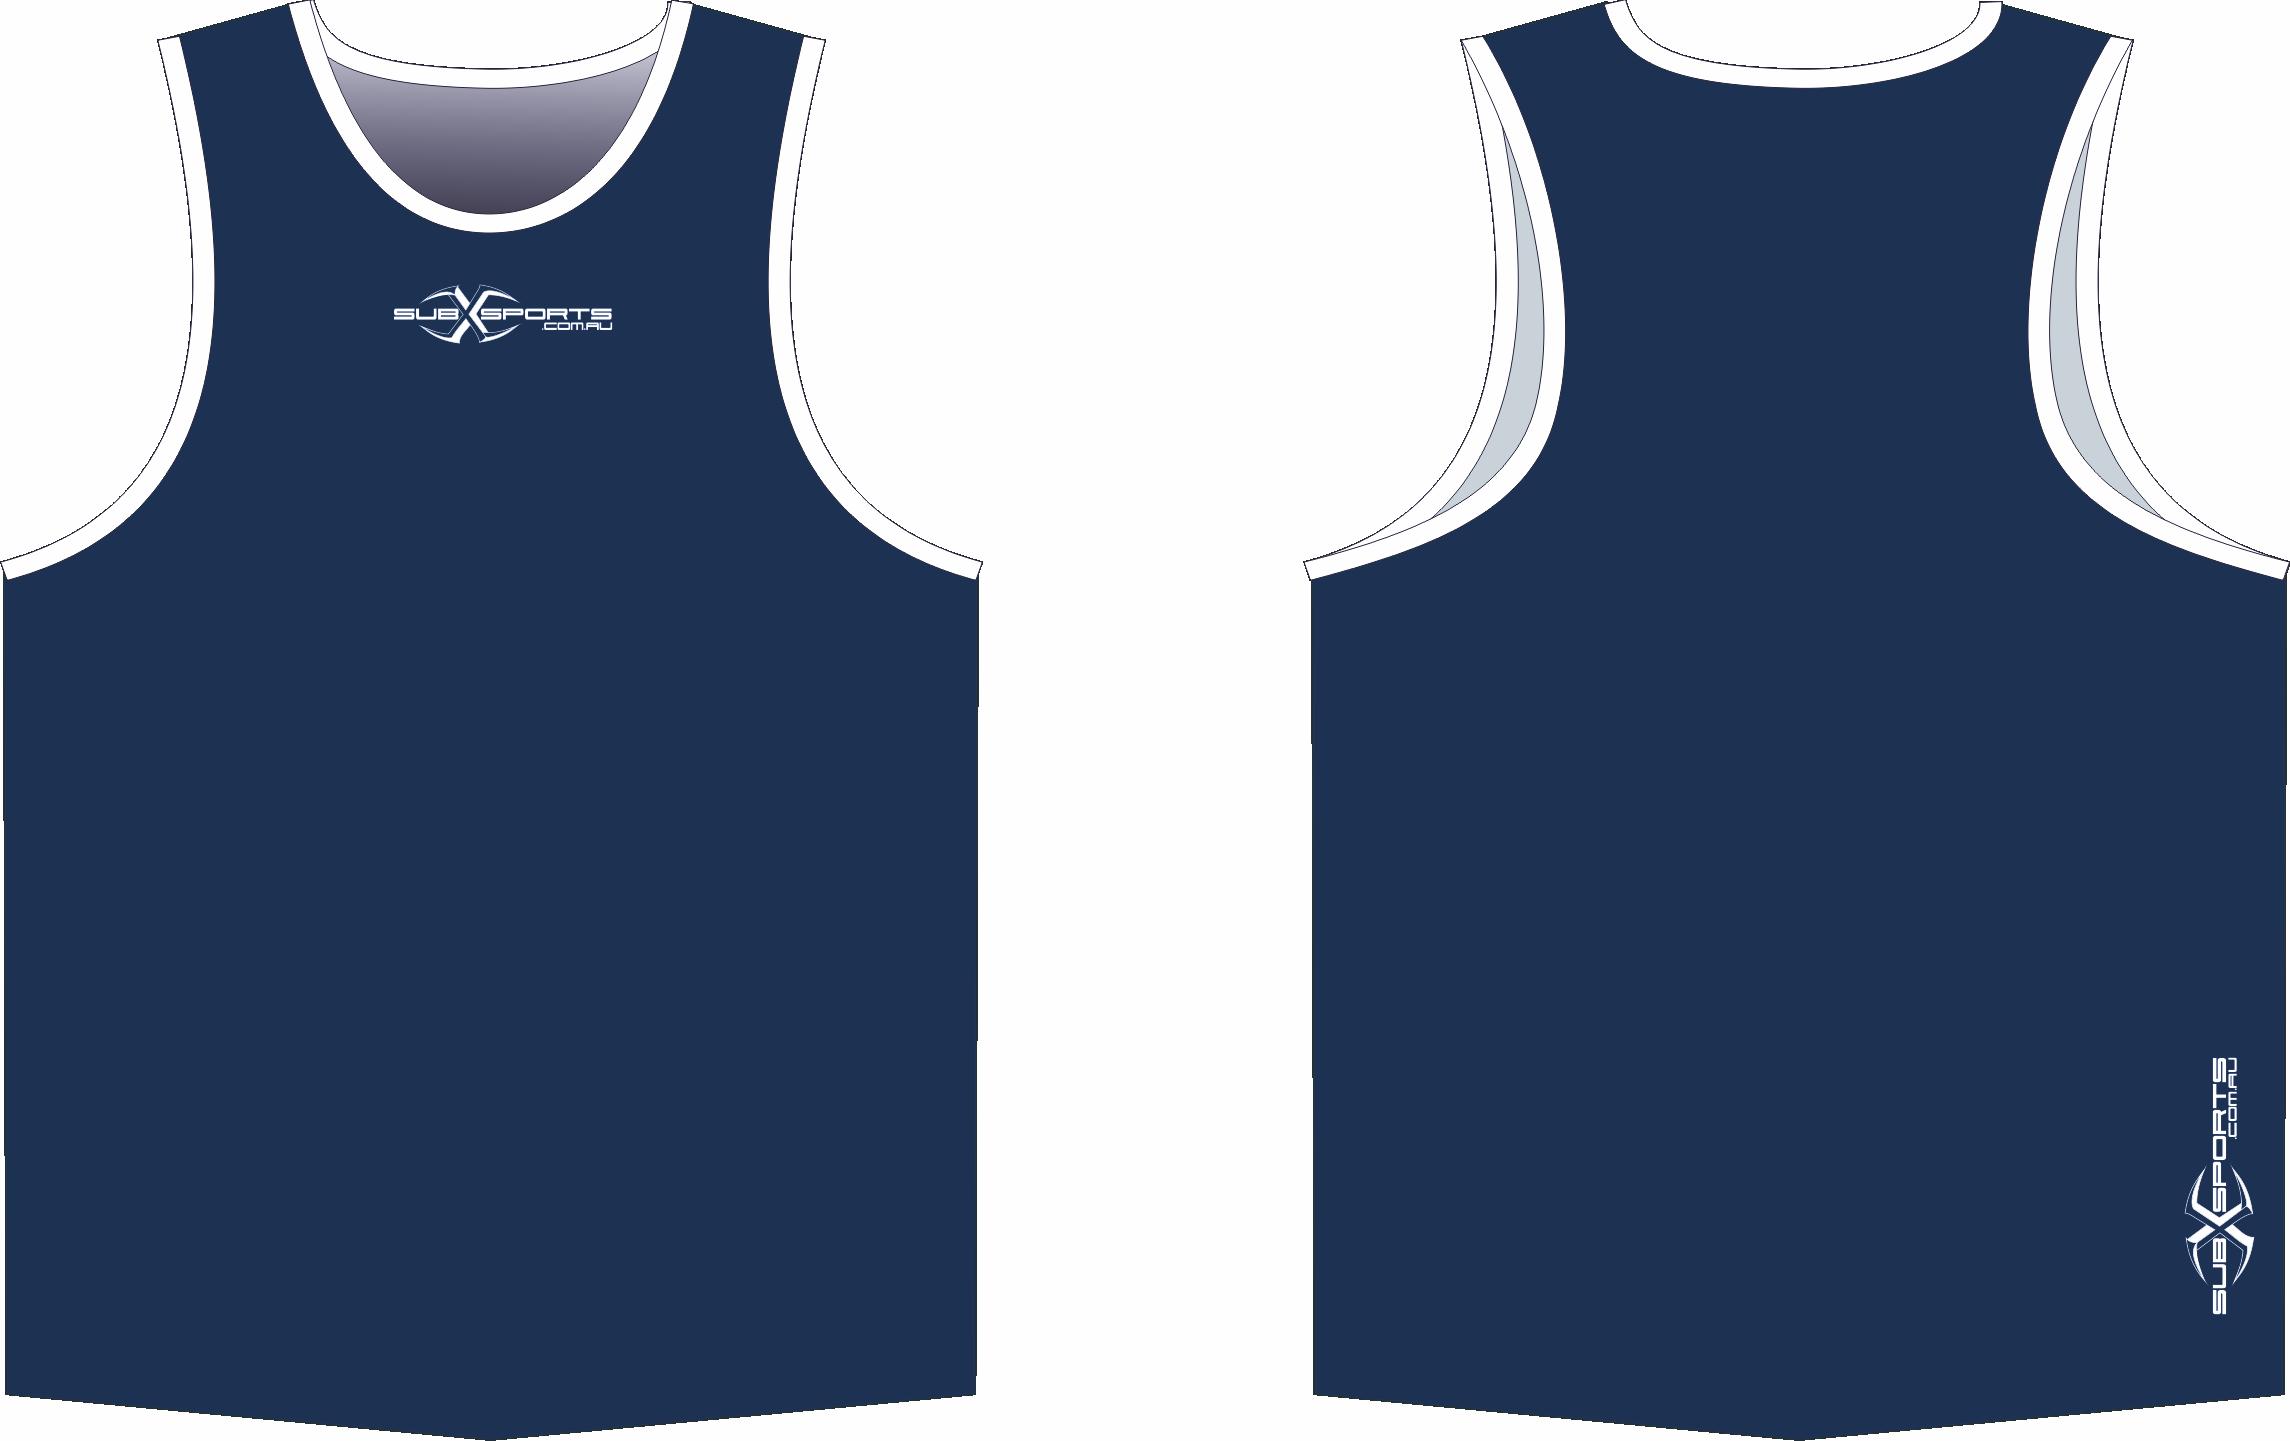 S206XS Singlet Navy White.png